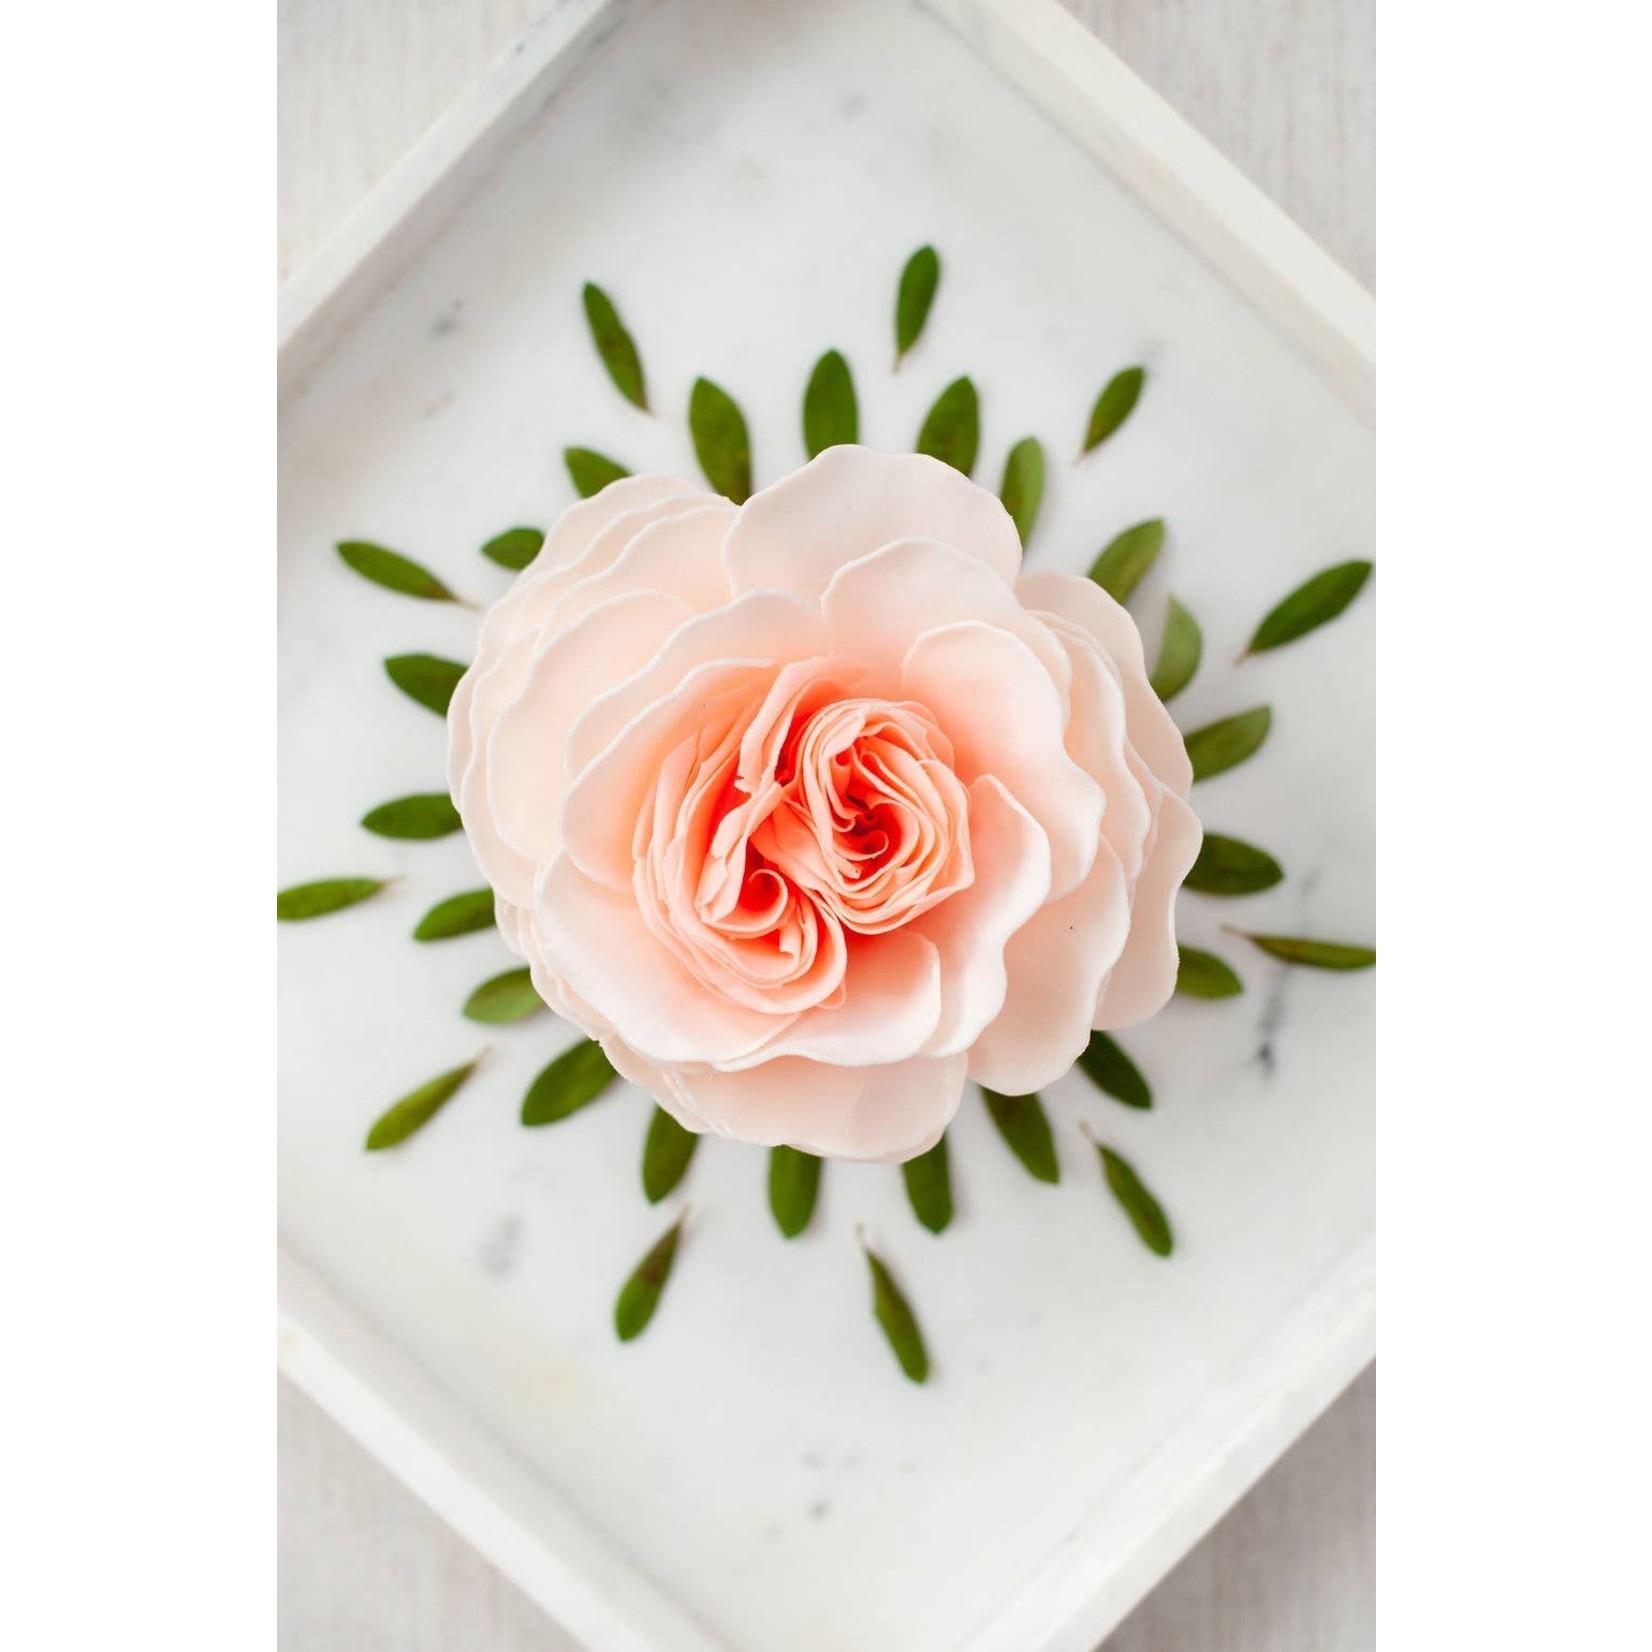 A'marie's Bath Flower Shop Serendipity Bathing Petal Soap Flower